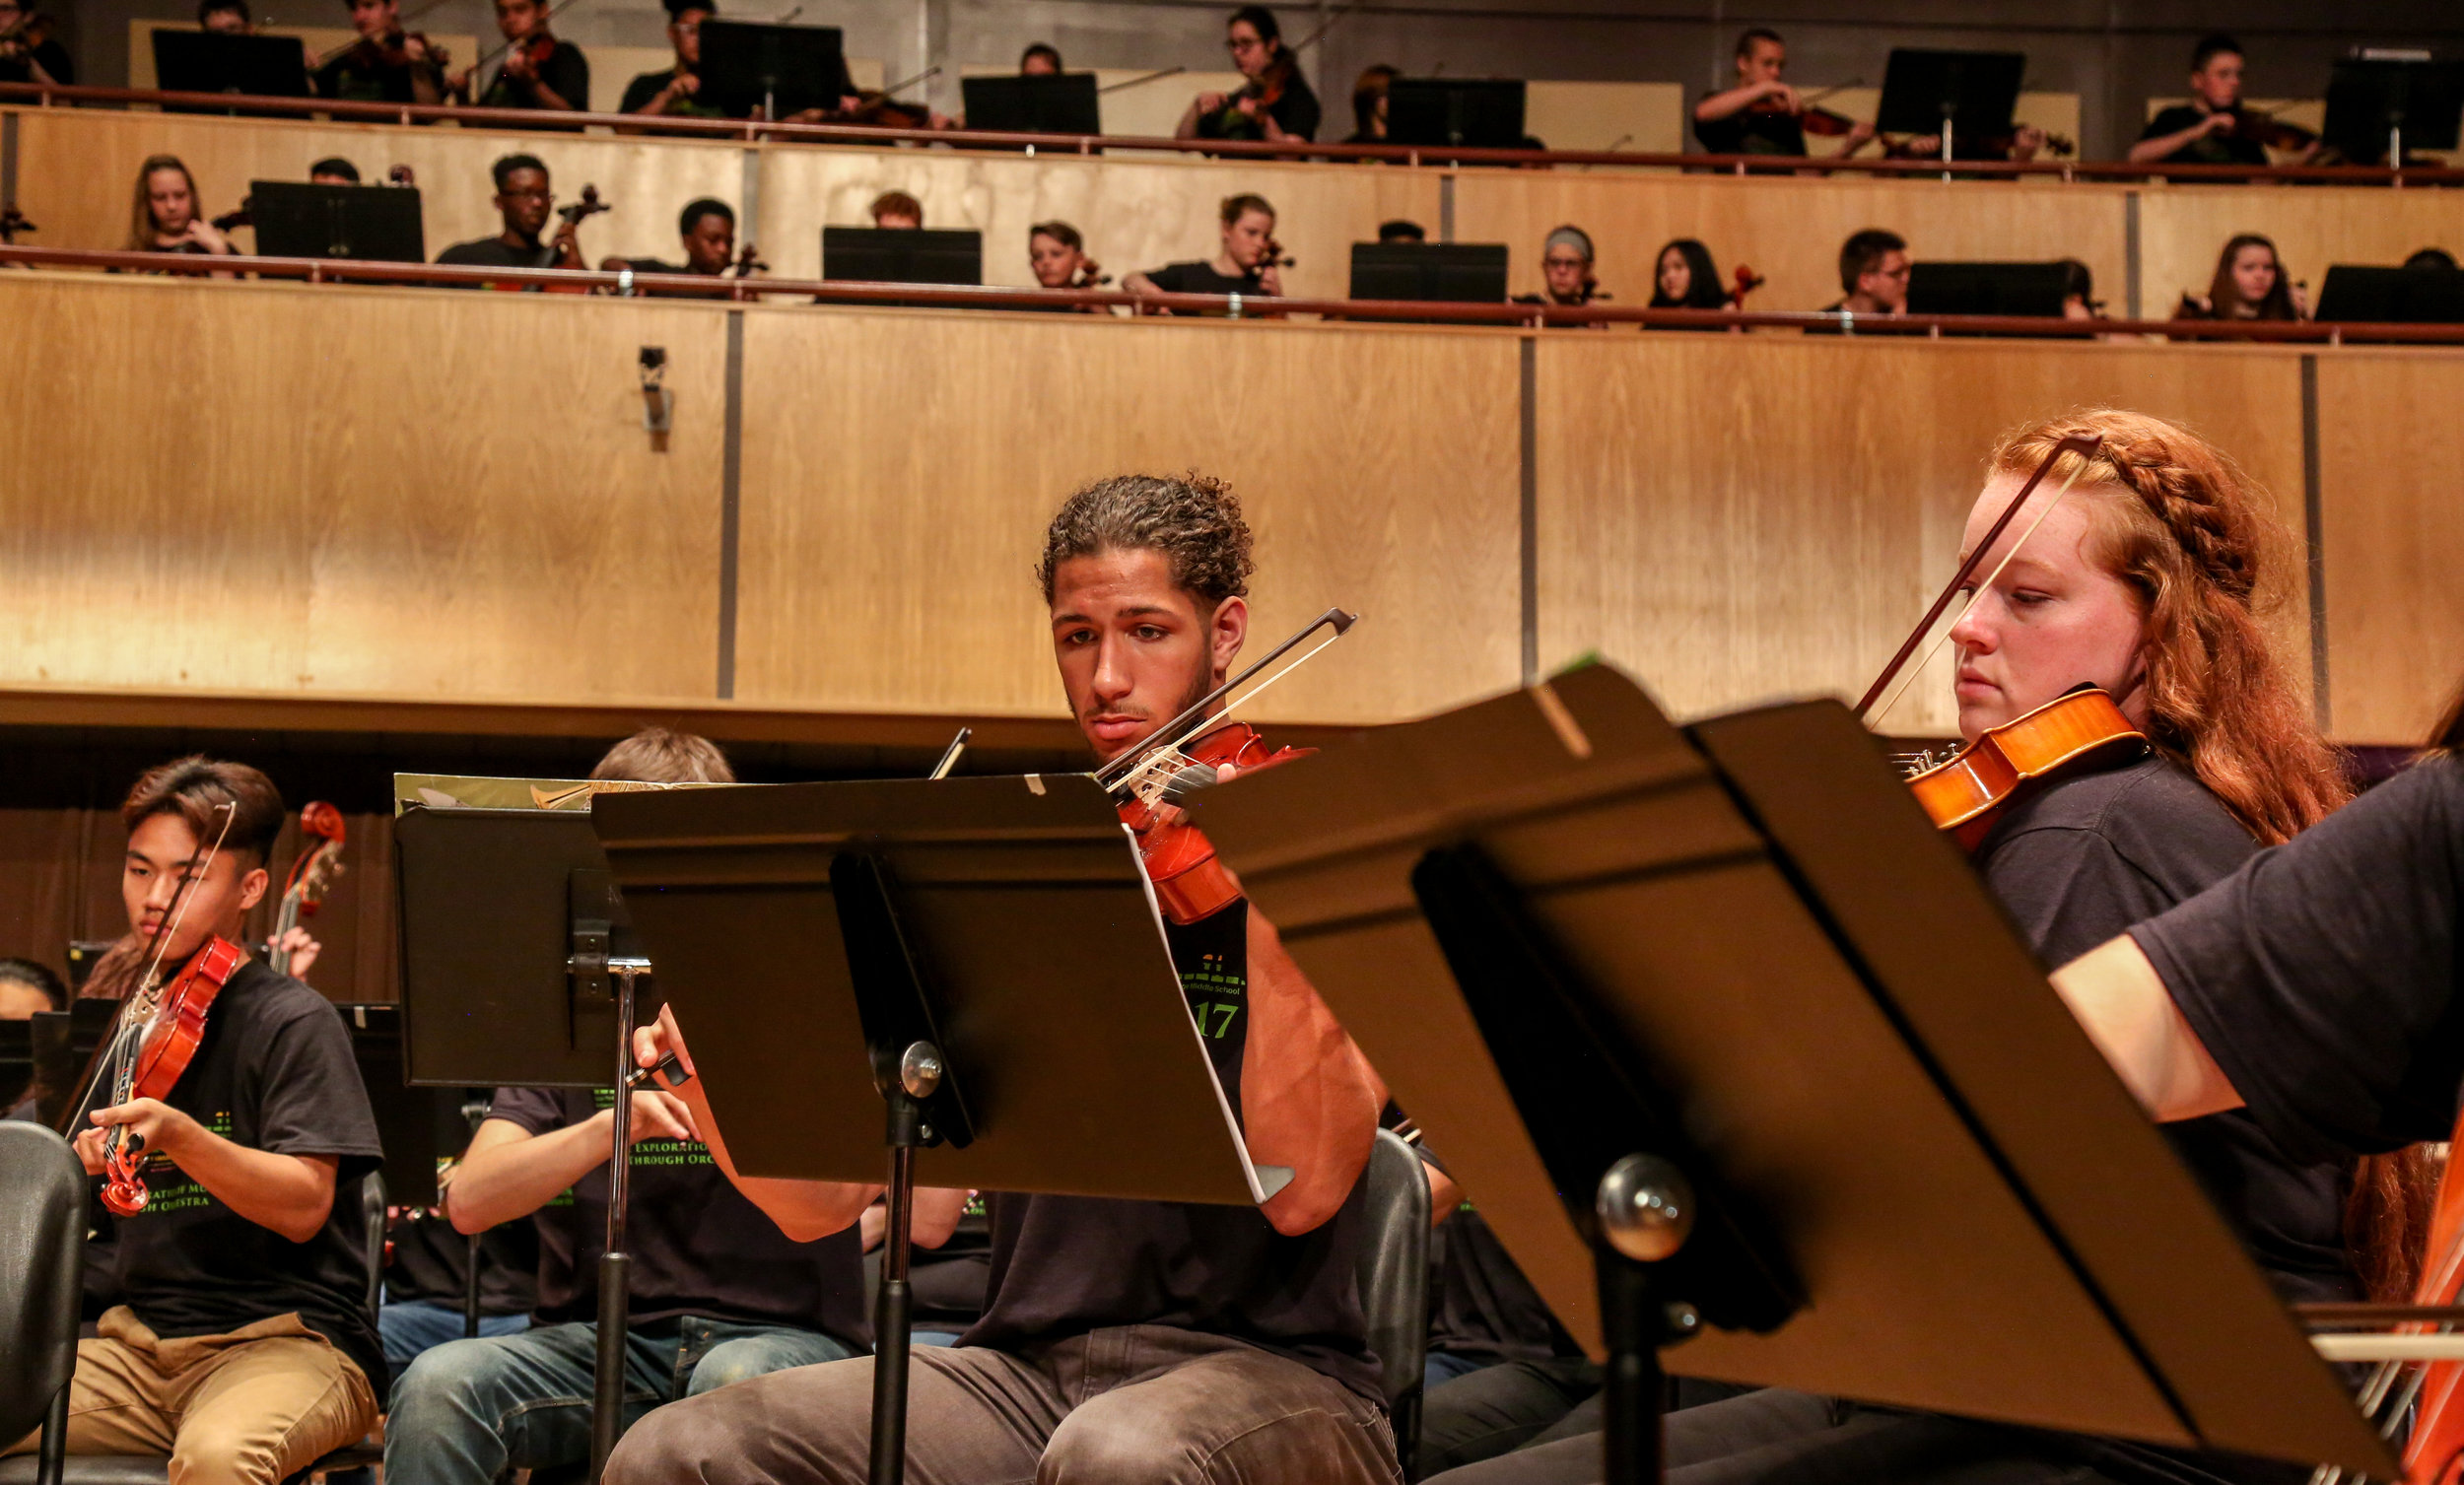 2017 Exploration of Music through Orchestra